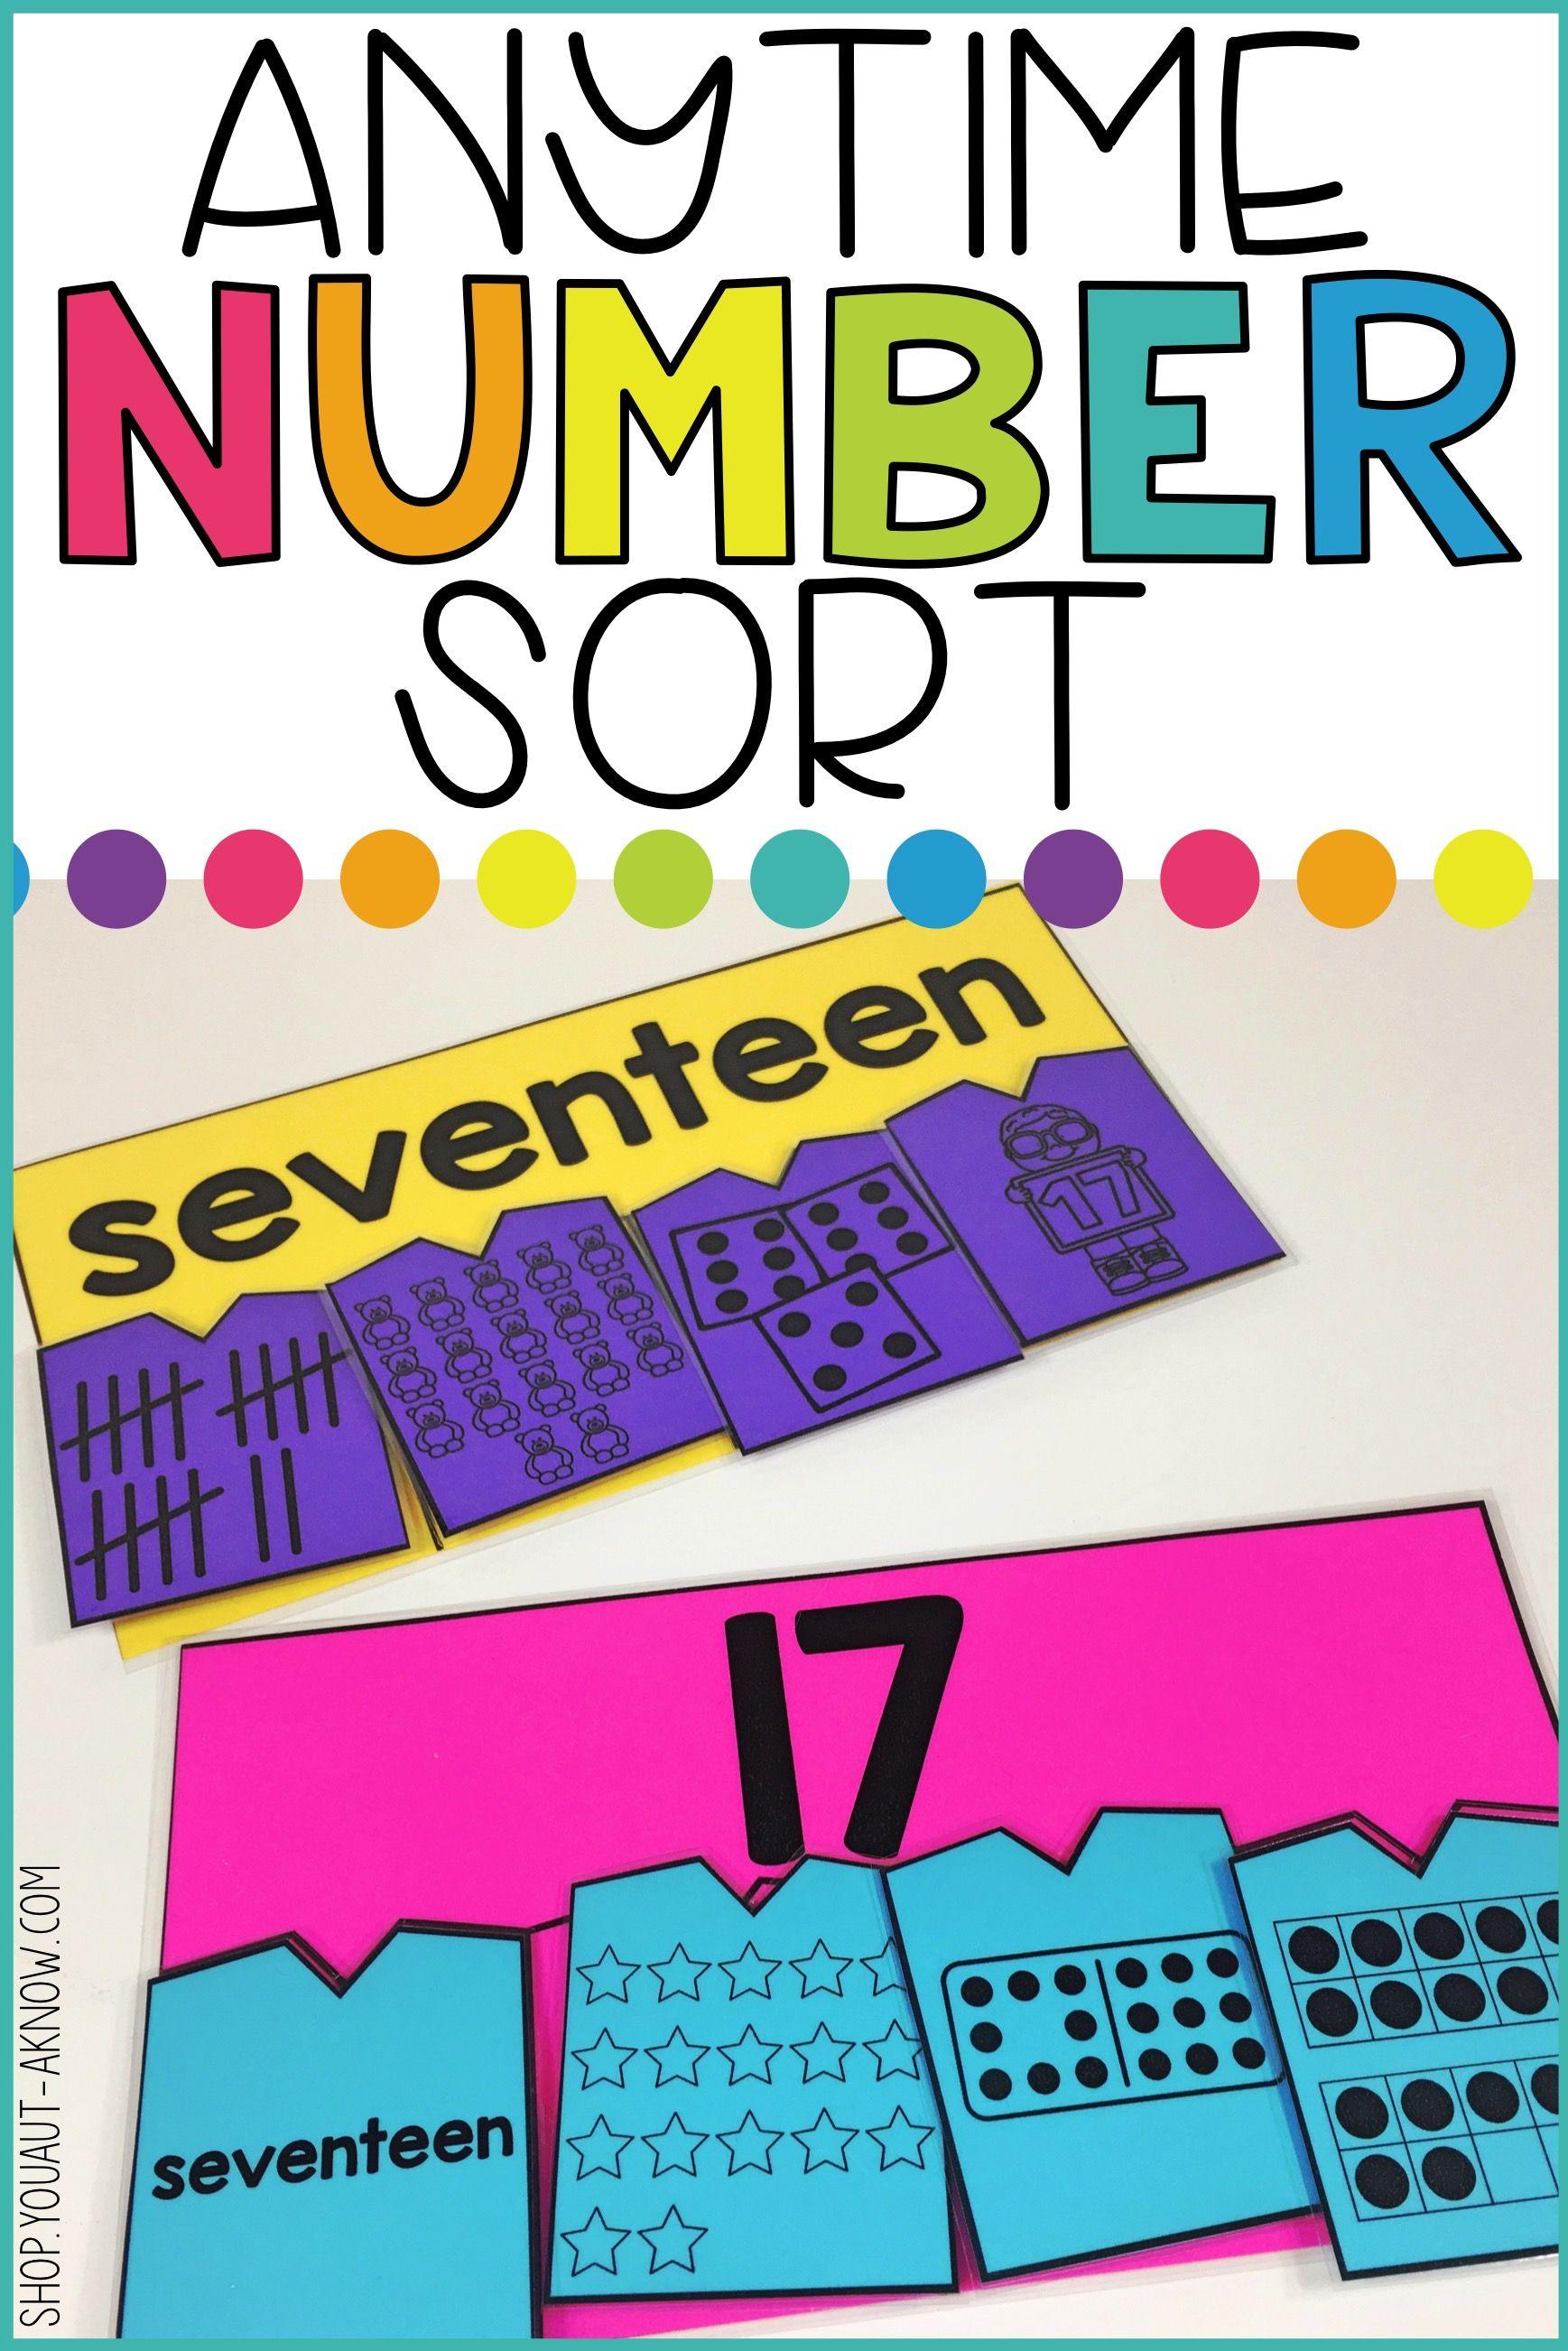 Laminate Velcro And Go Anytime Number Sort 1 20 Tasks